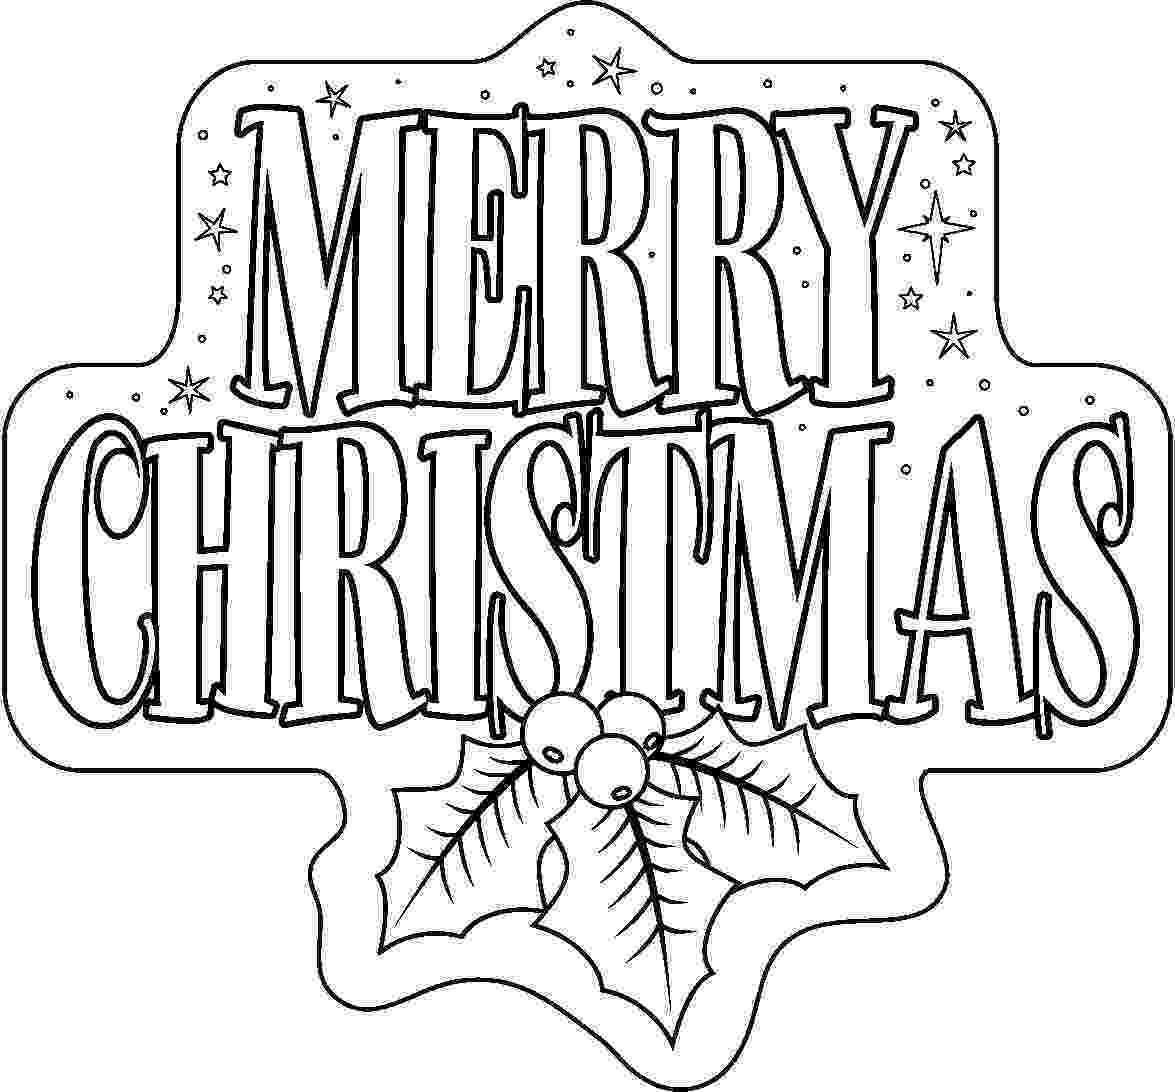 christmas card coloring nativity scene coloring pages hellokidscom coloring christmas card